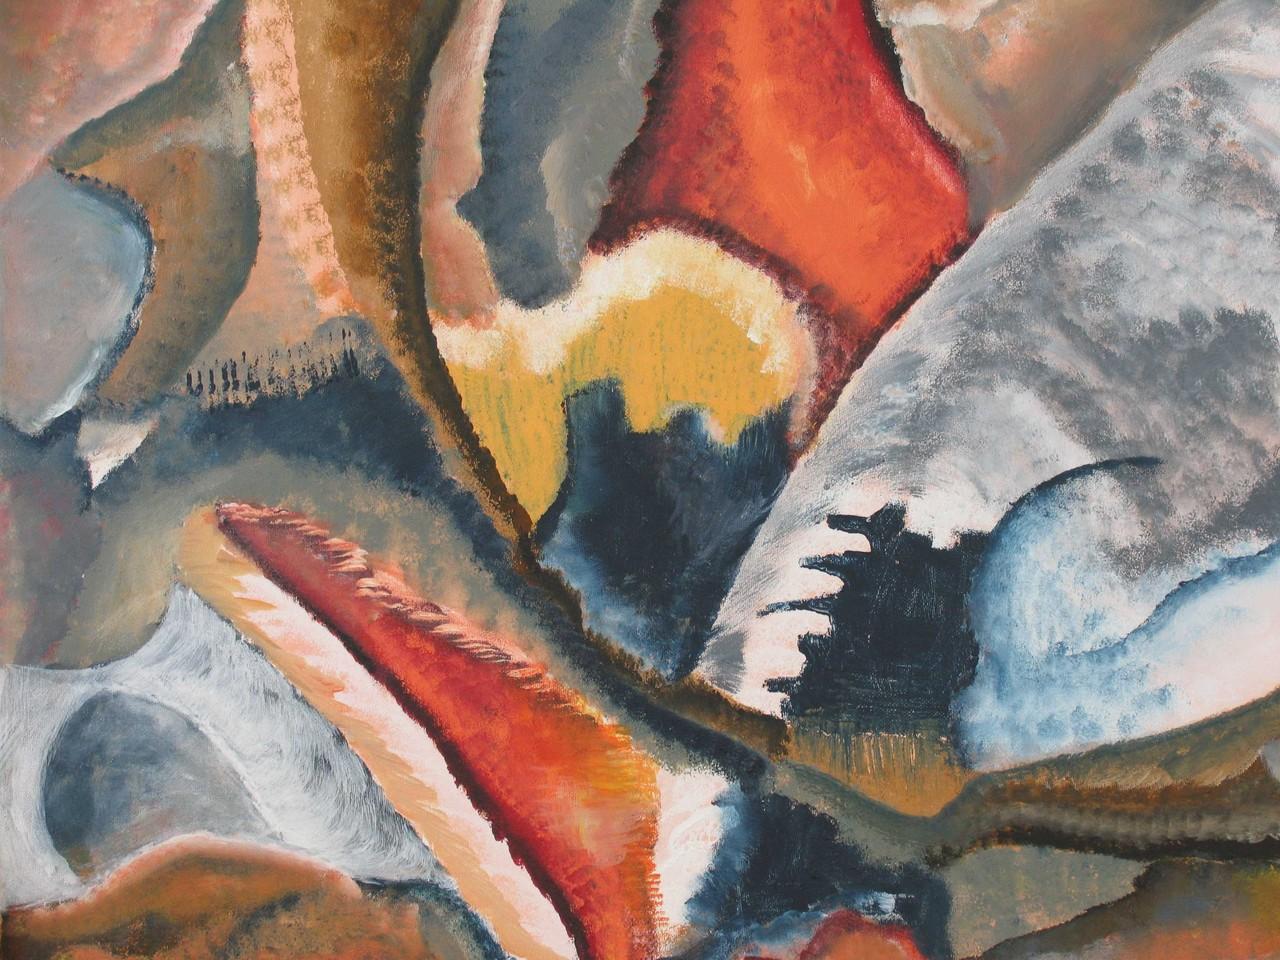 Hai, Acryl auf Leinwand, 50 x 70 cm